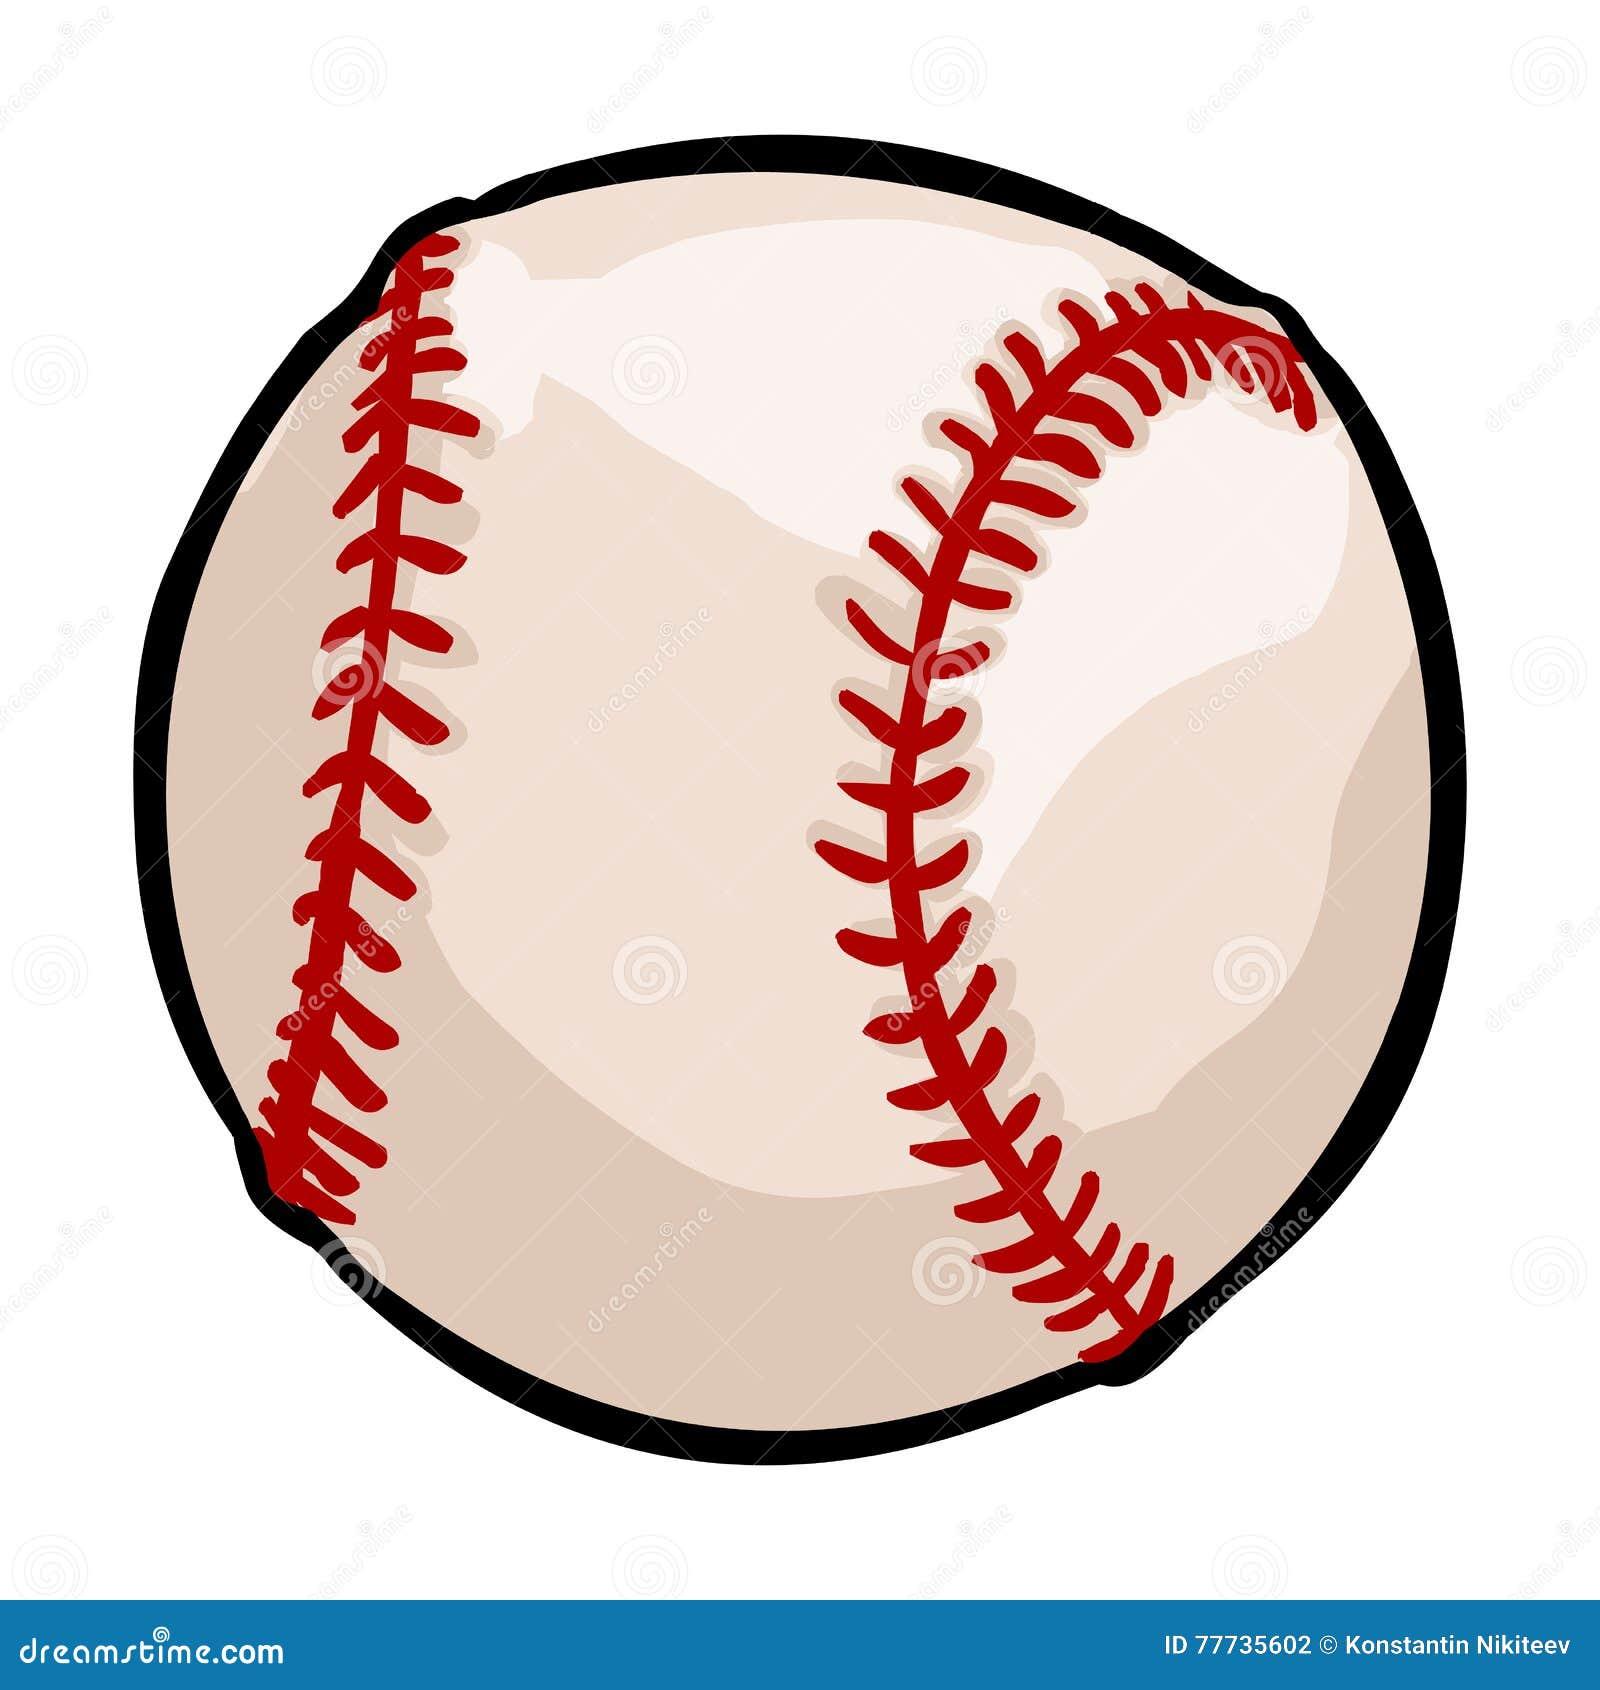 Sola bola del béisbol de la historieta del vector en el fondo blanco e7f3227ec2deb